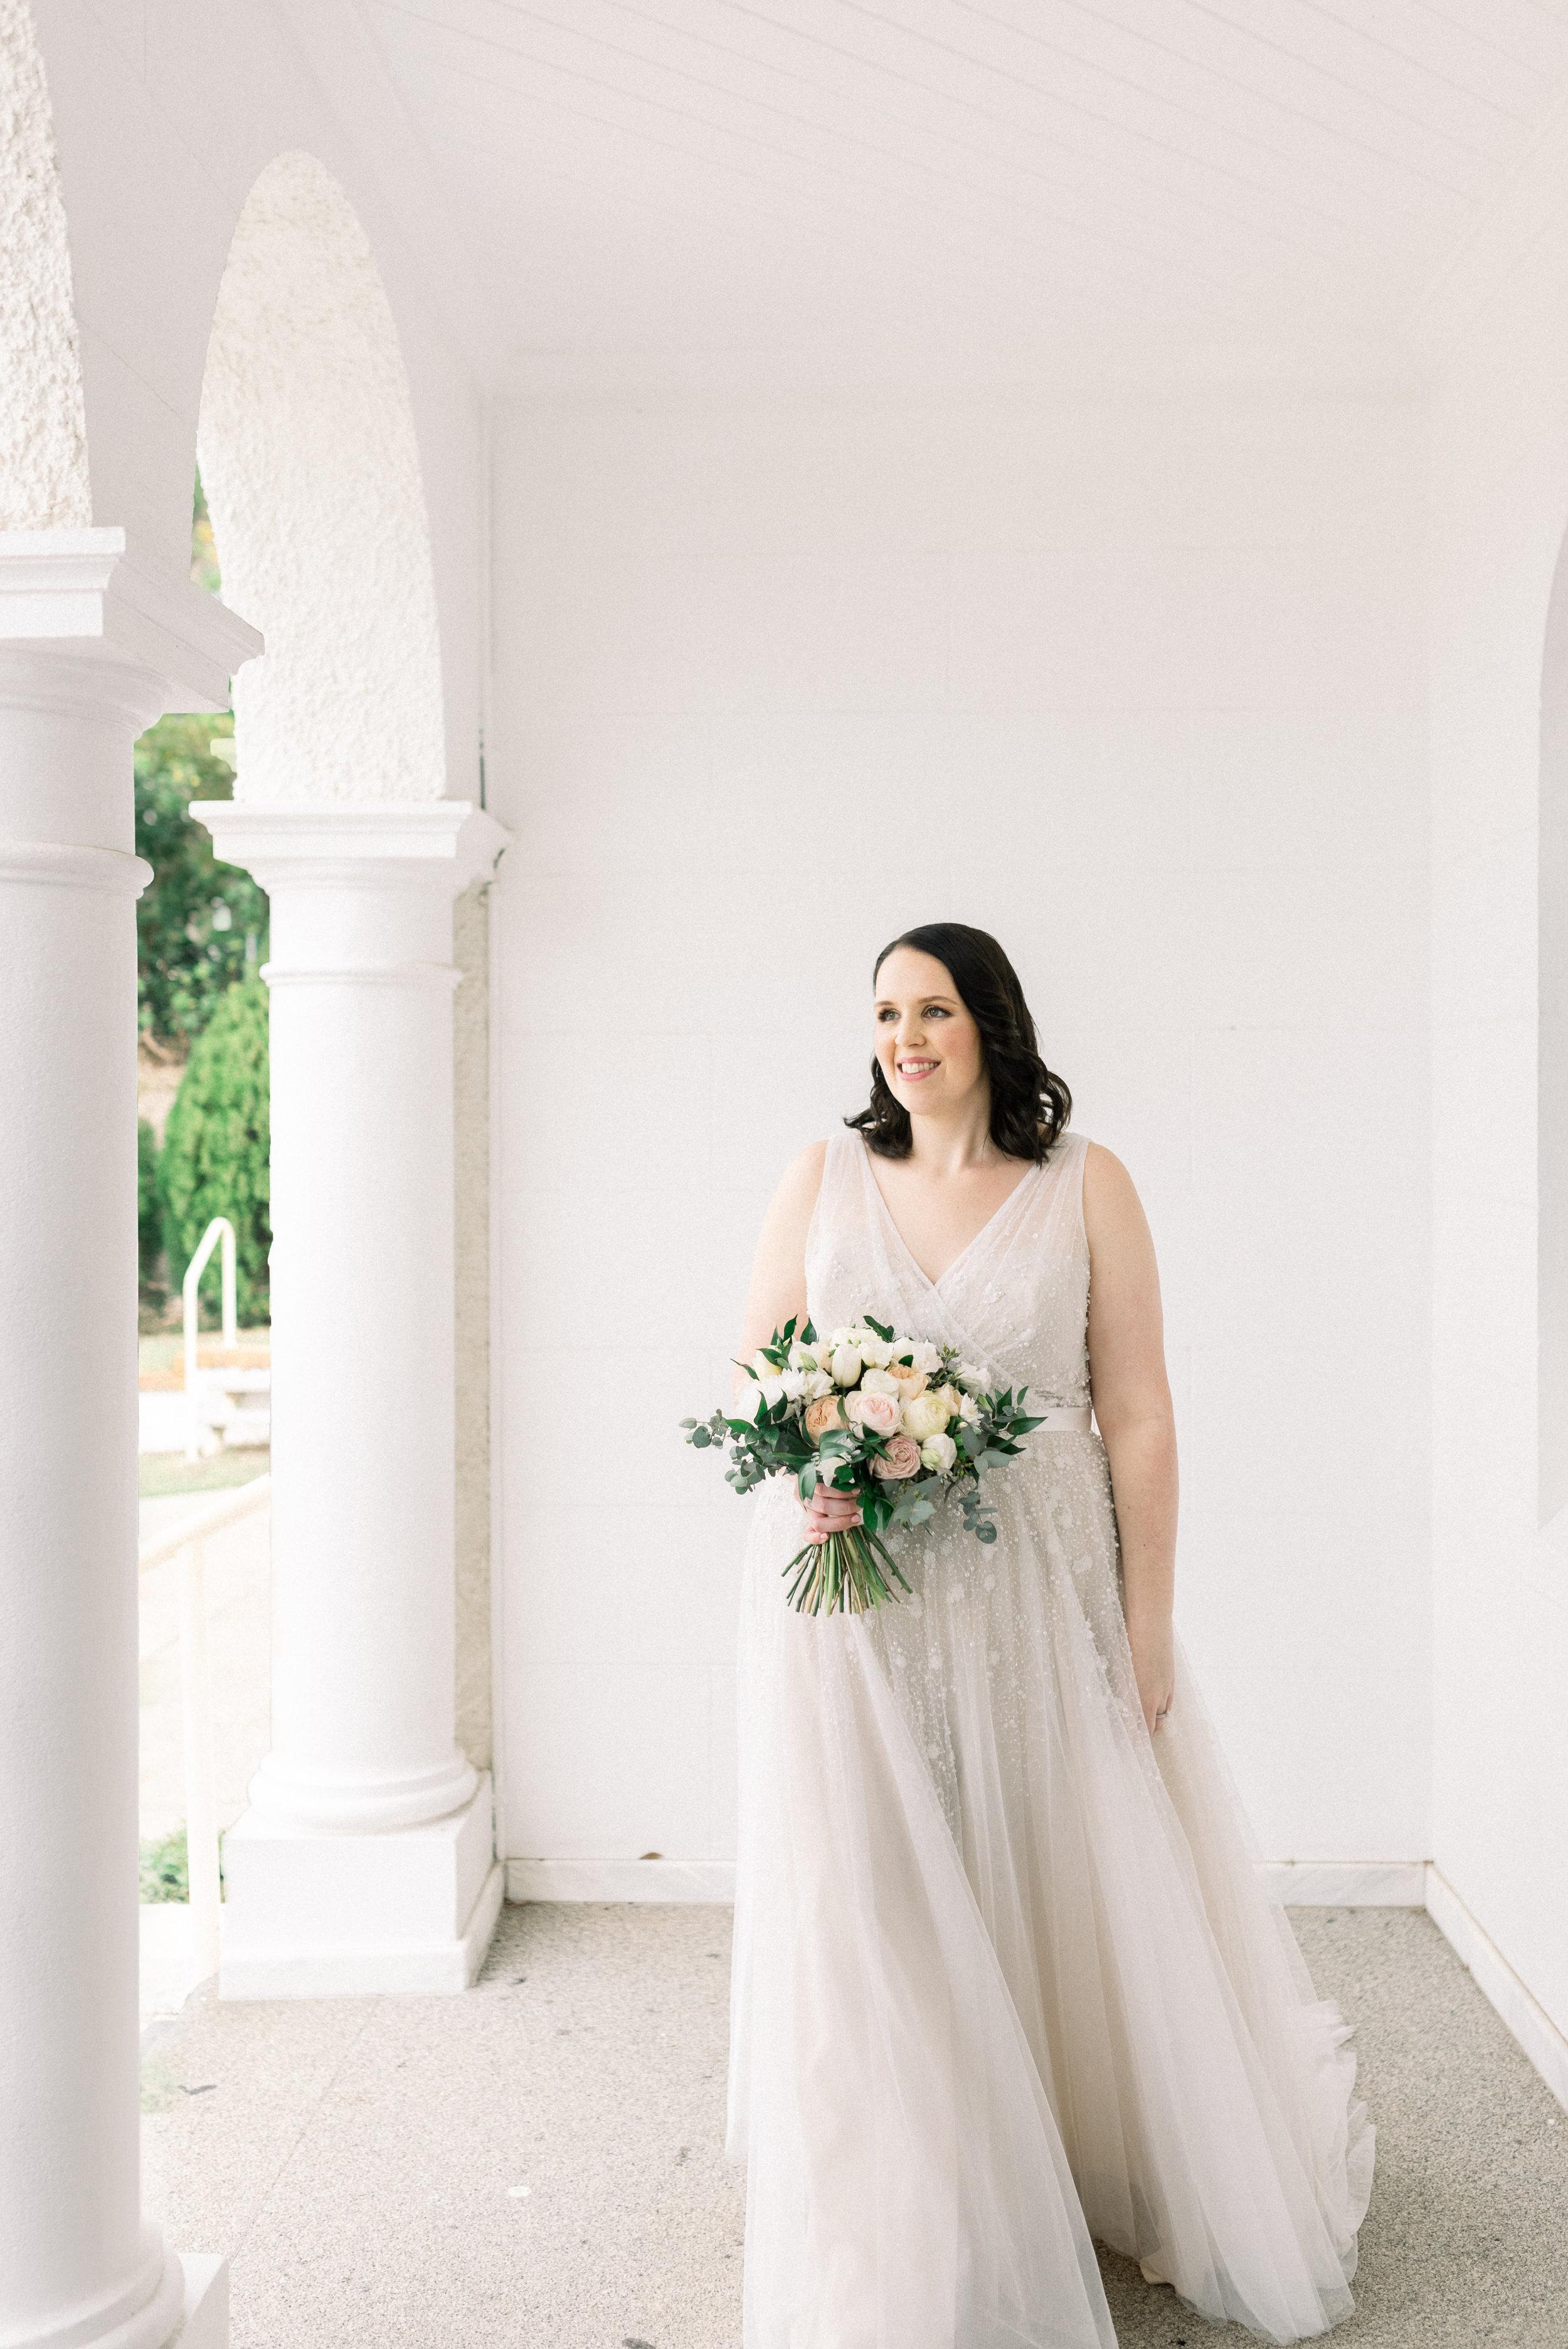 brisbane-city-wedding-photographer-romantic-wedding-51.jpg